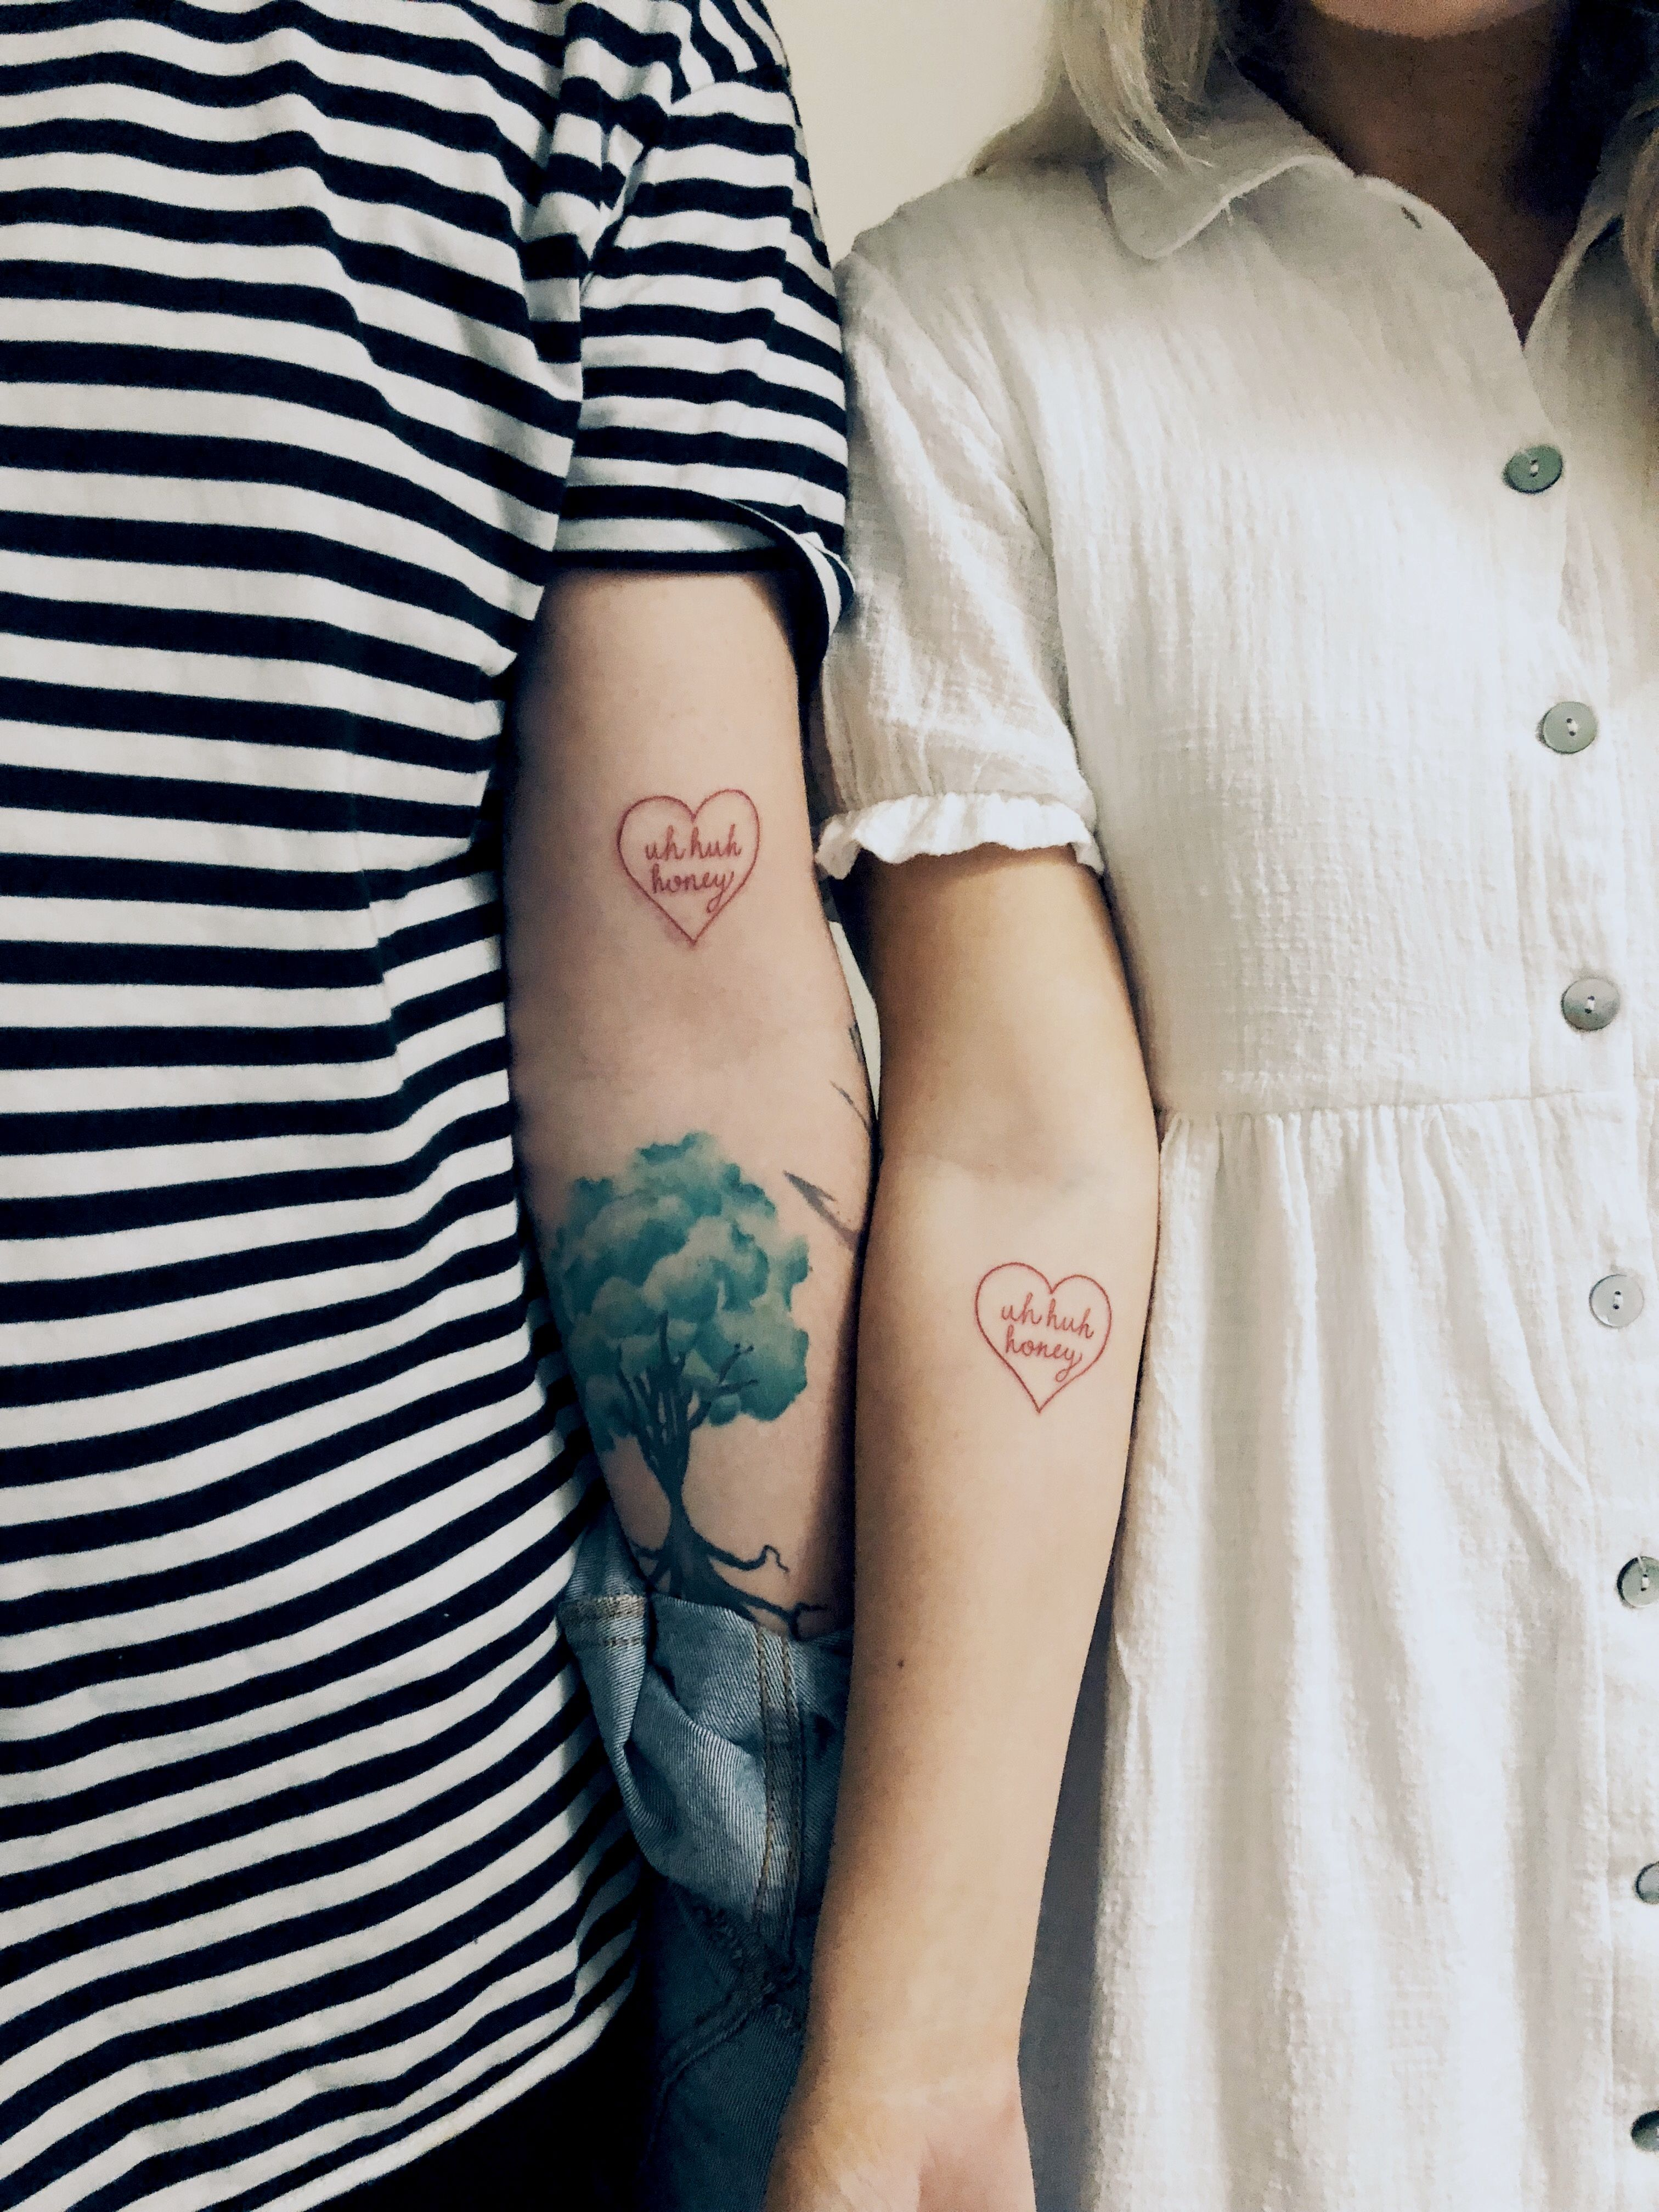 Anna besso nova : Uh huh honey tattoo